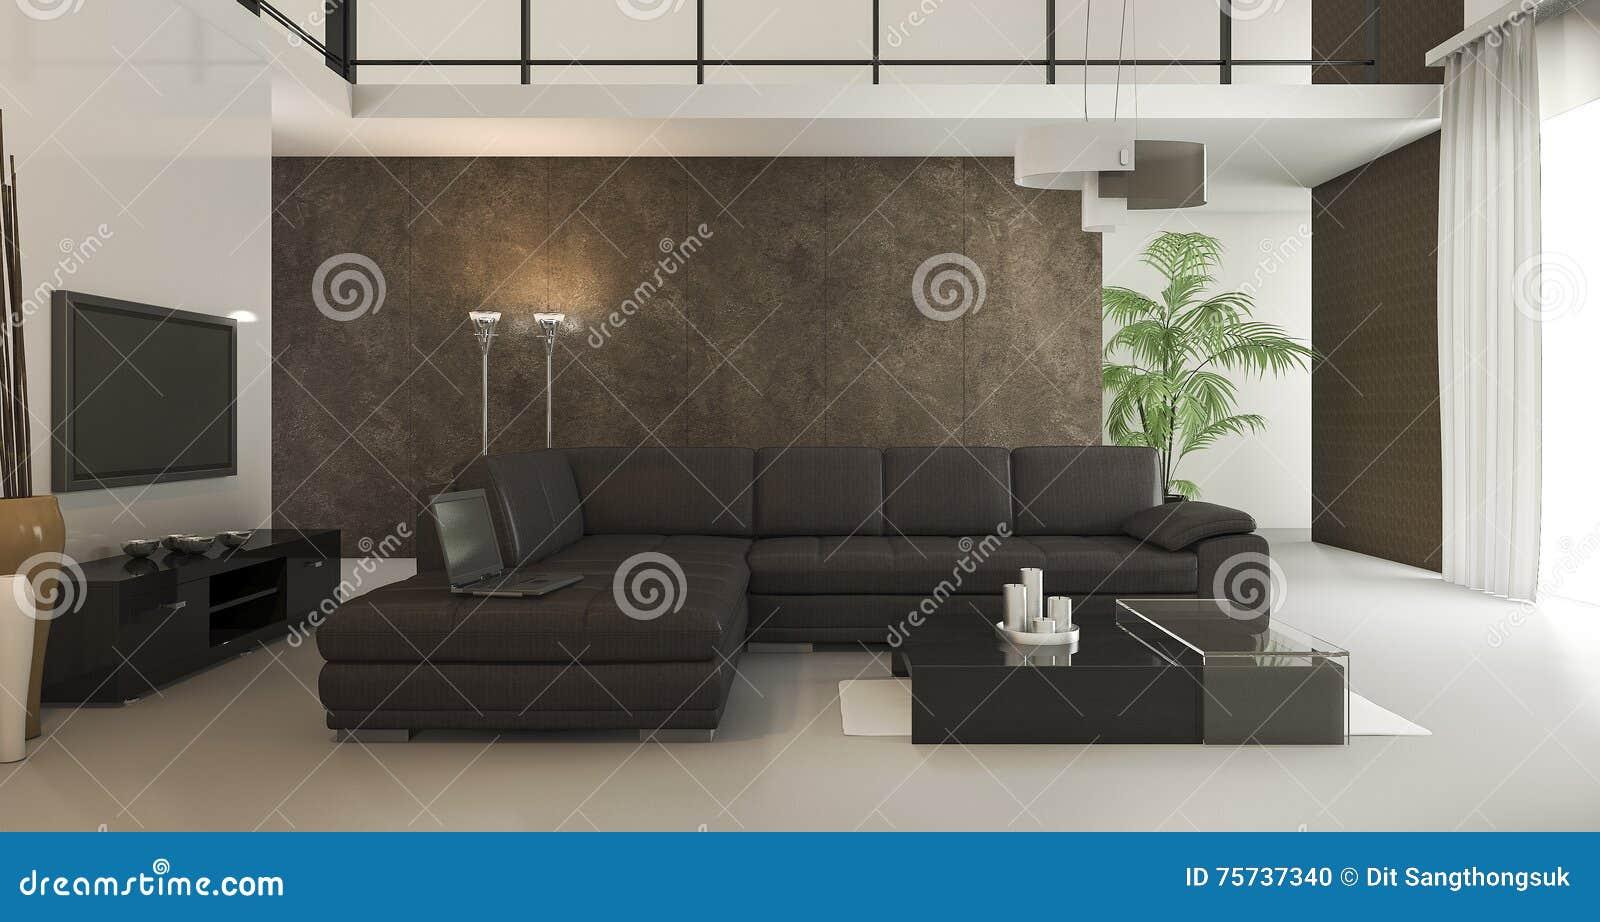 3d rendering loft brown wallpaper living room with for Brown wallpaper for living room